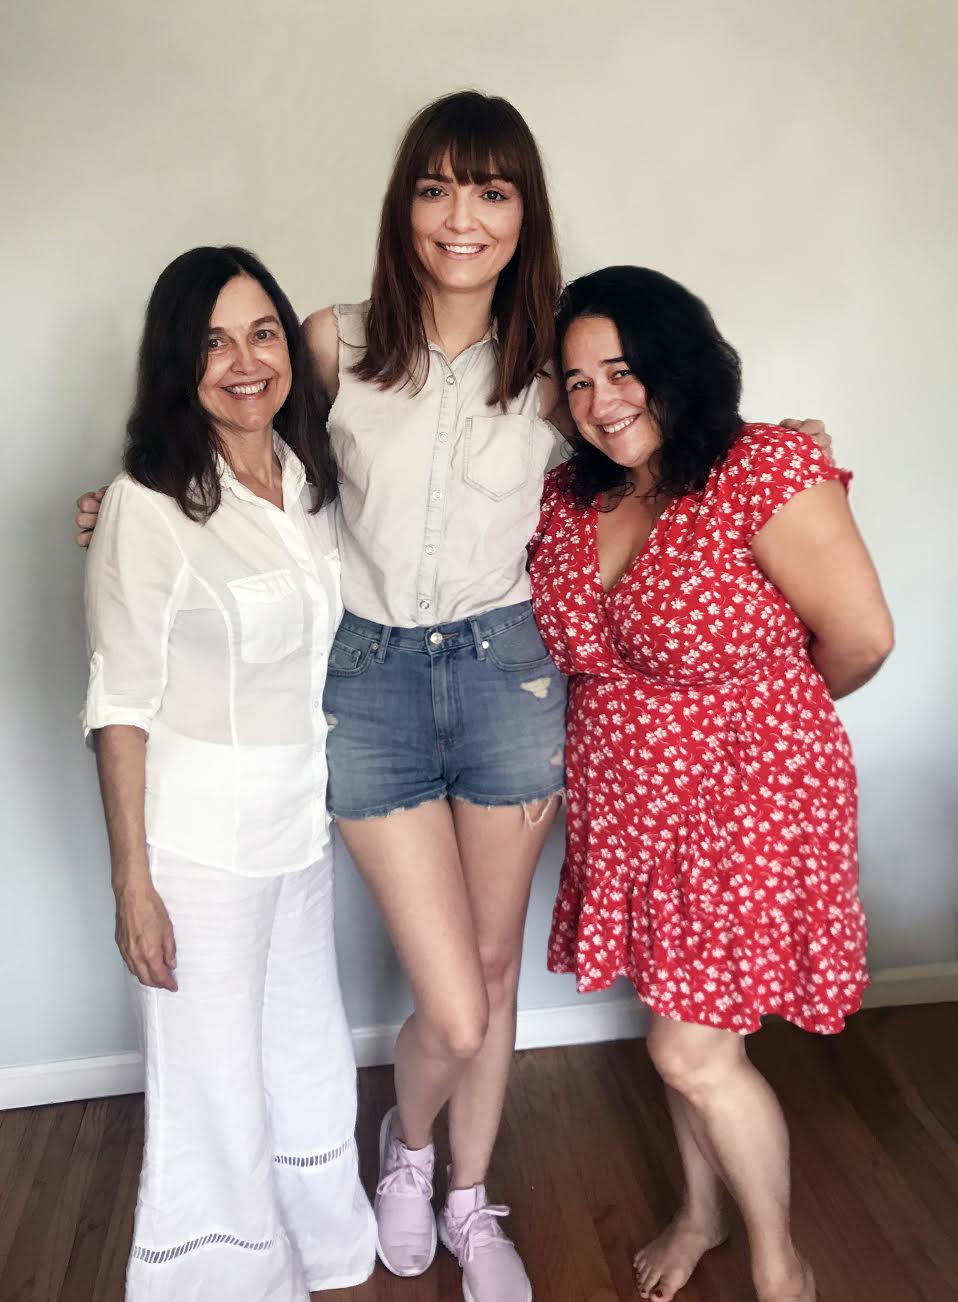 Jackie with Jenefer and Melissa Palmer, the fab women behind OSEA Malibu.